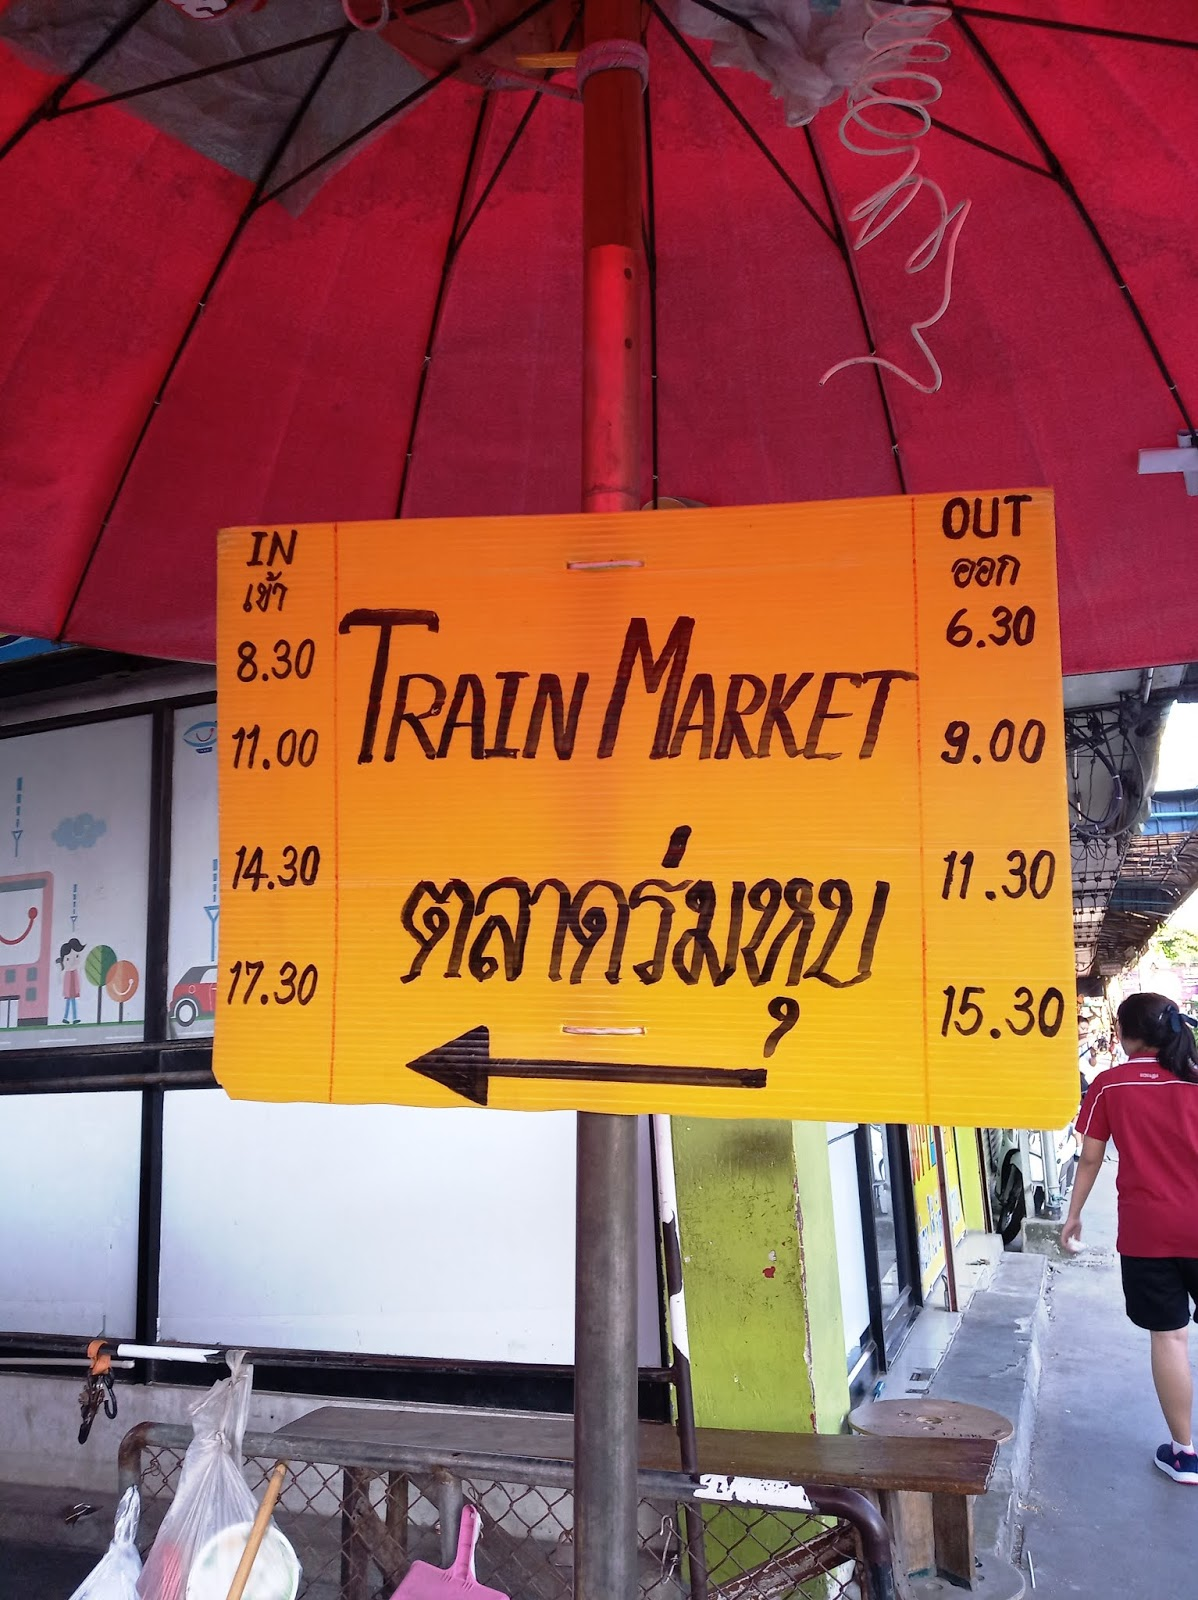 Maeklong train market schedule | Ummi Goes Where?